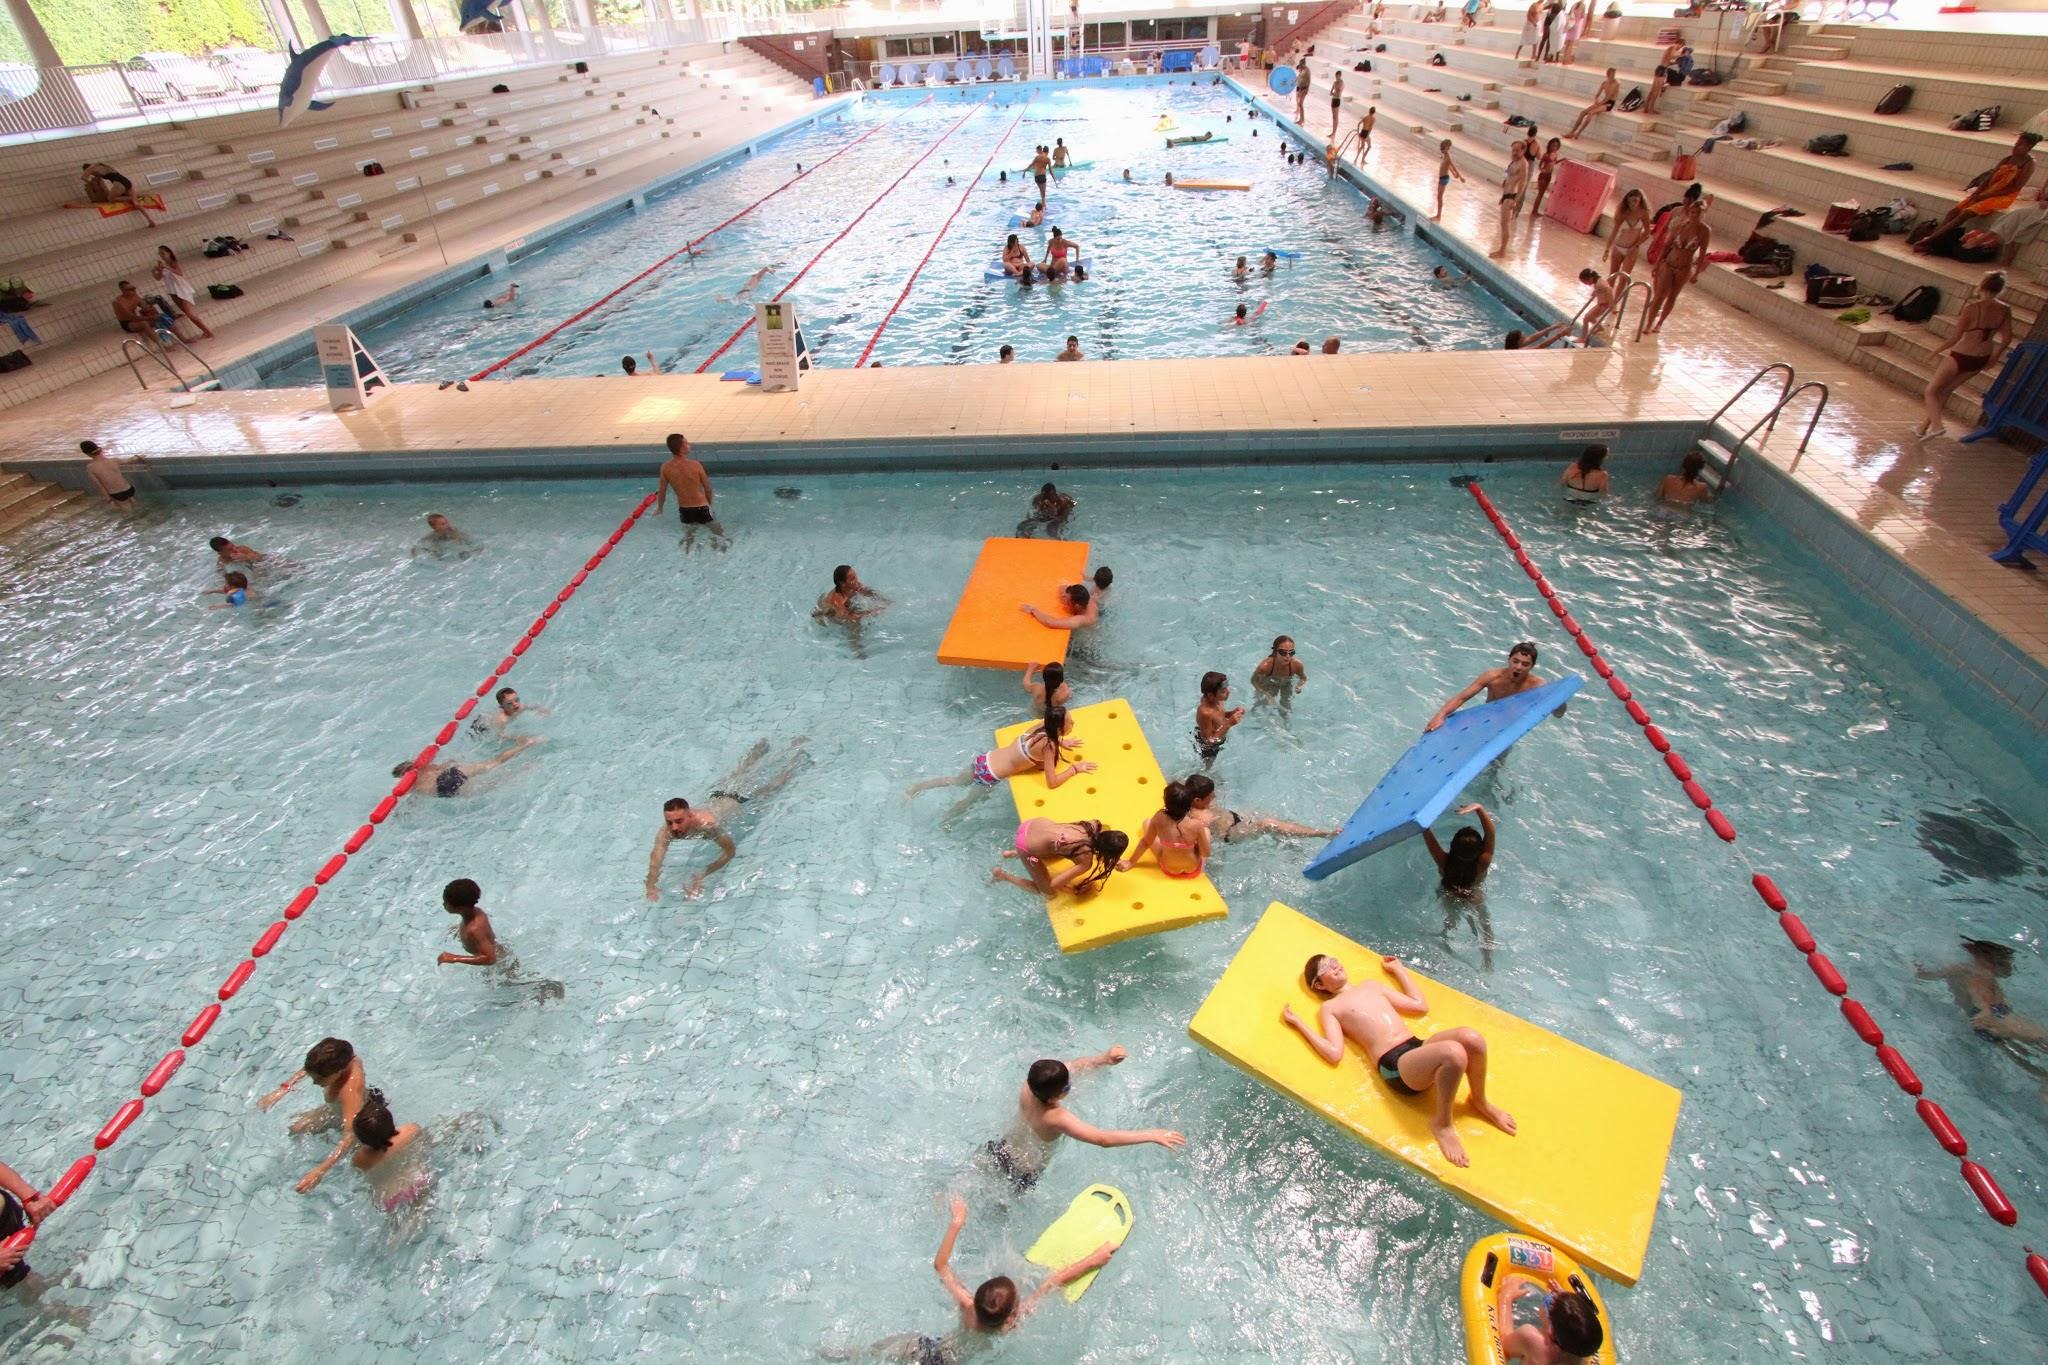 piscine saint germain en laye